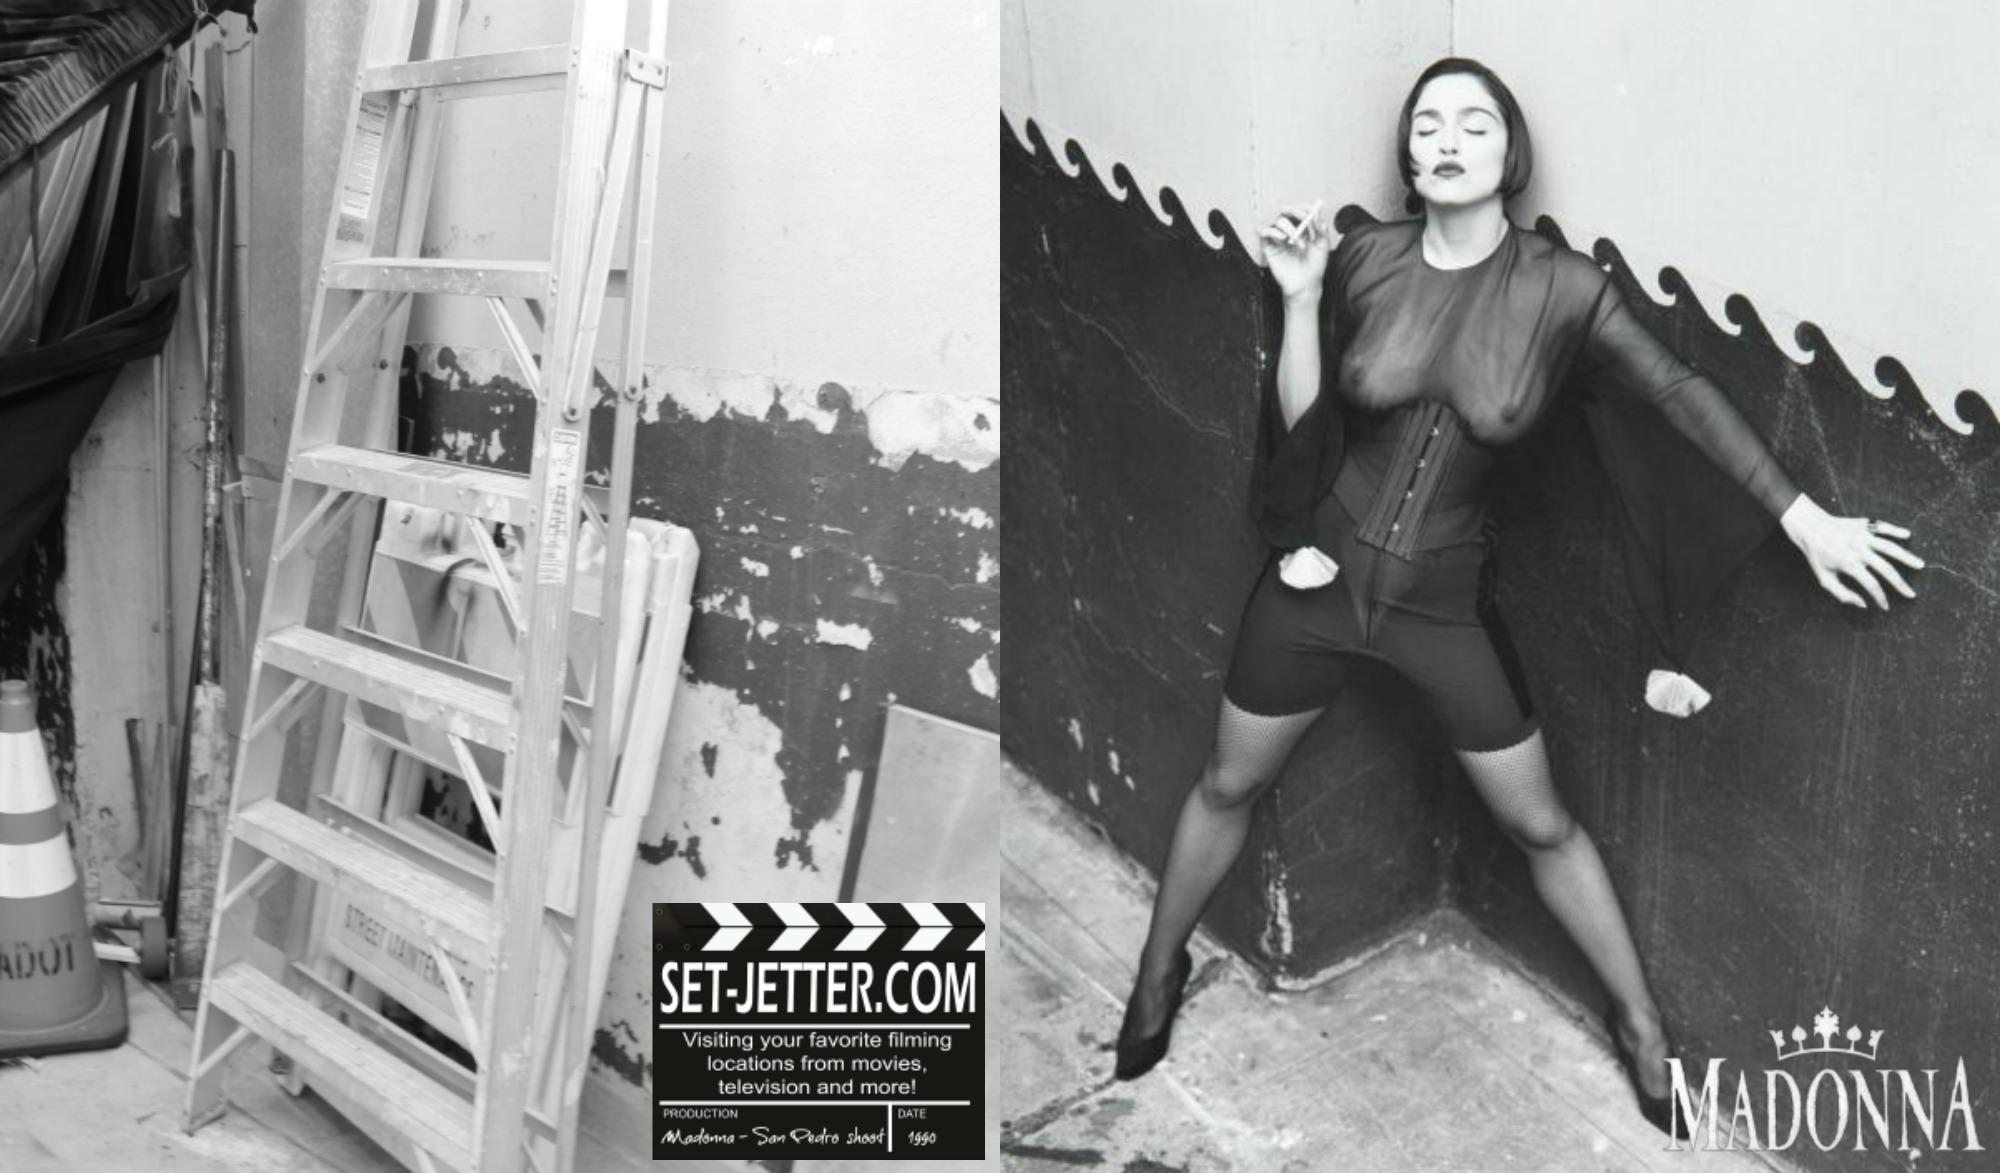 Madonna-HerbRitts-10a.jpg